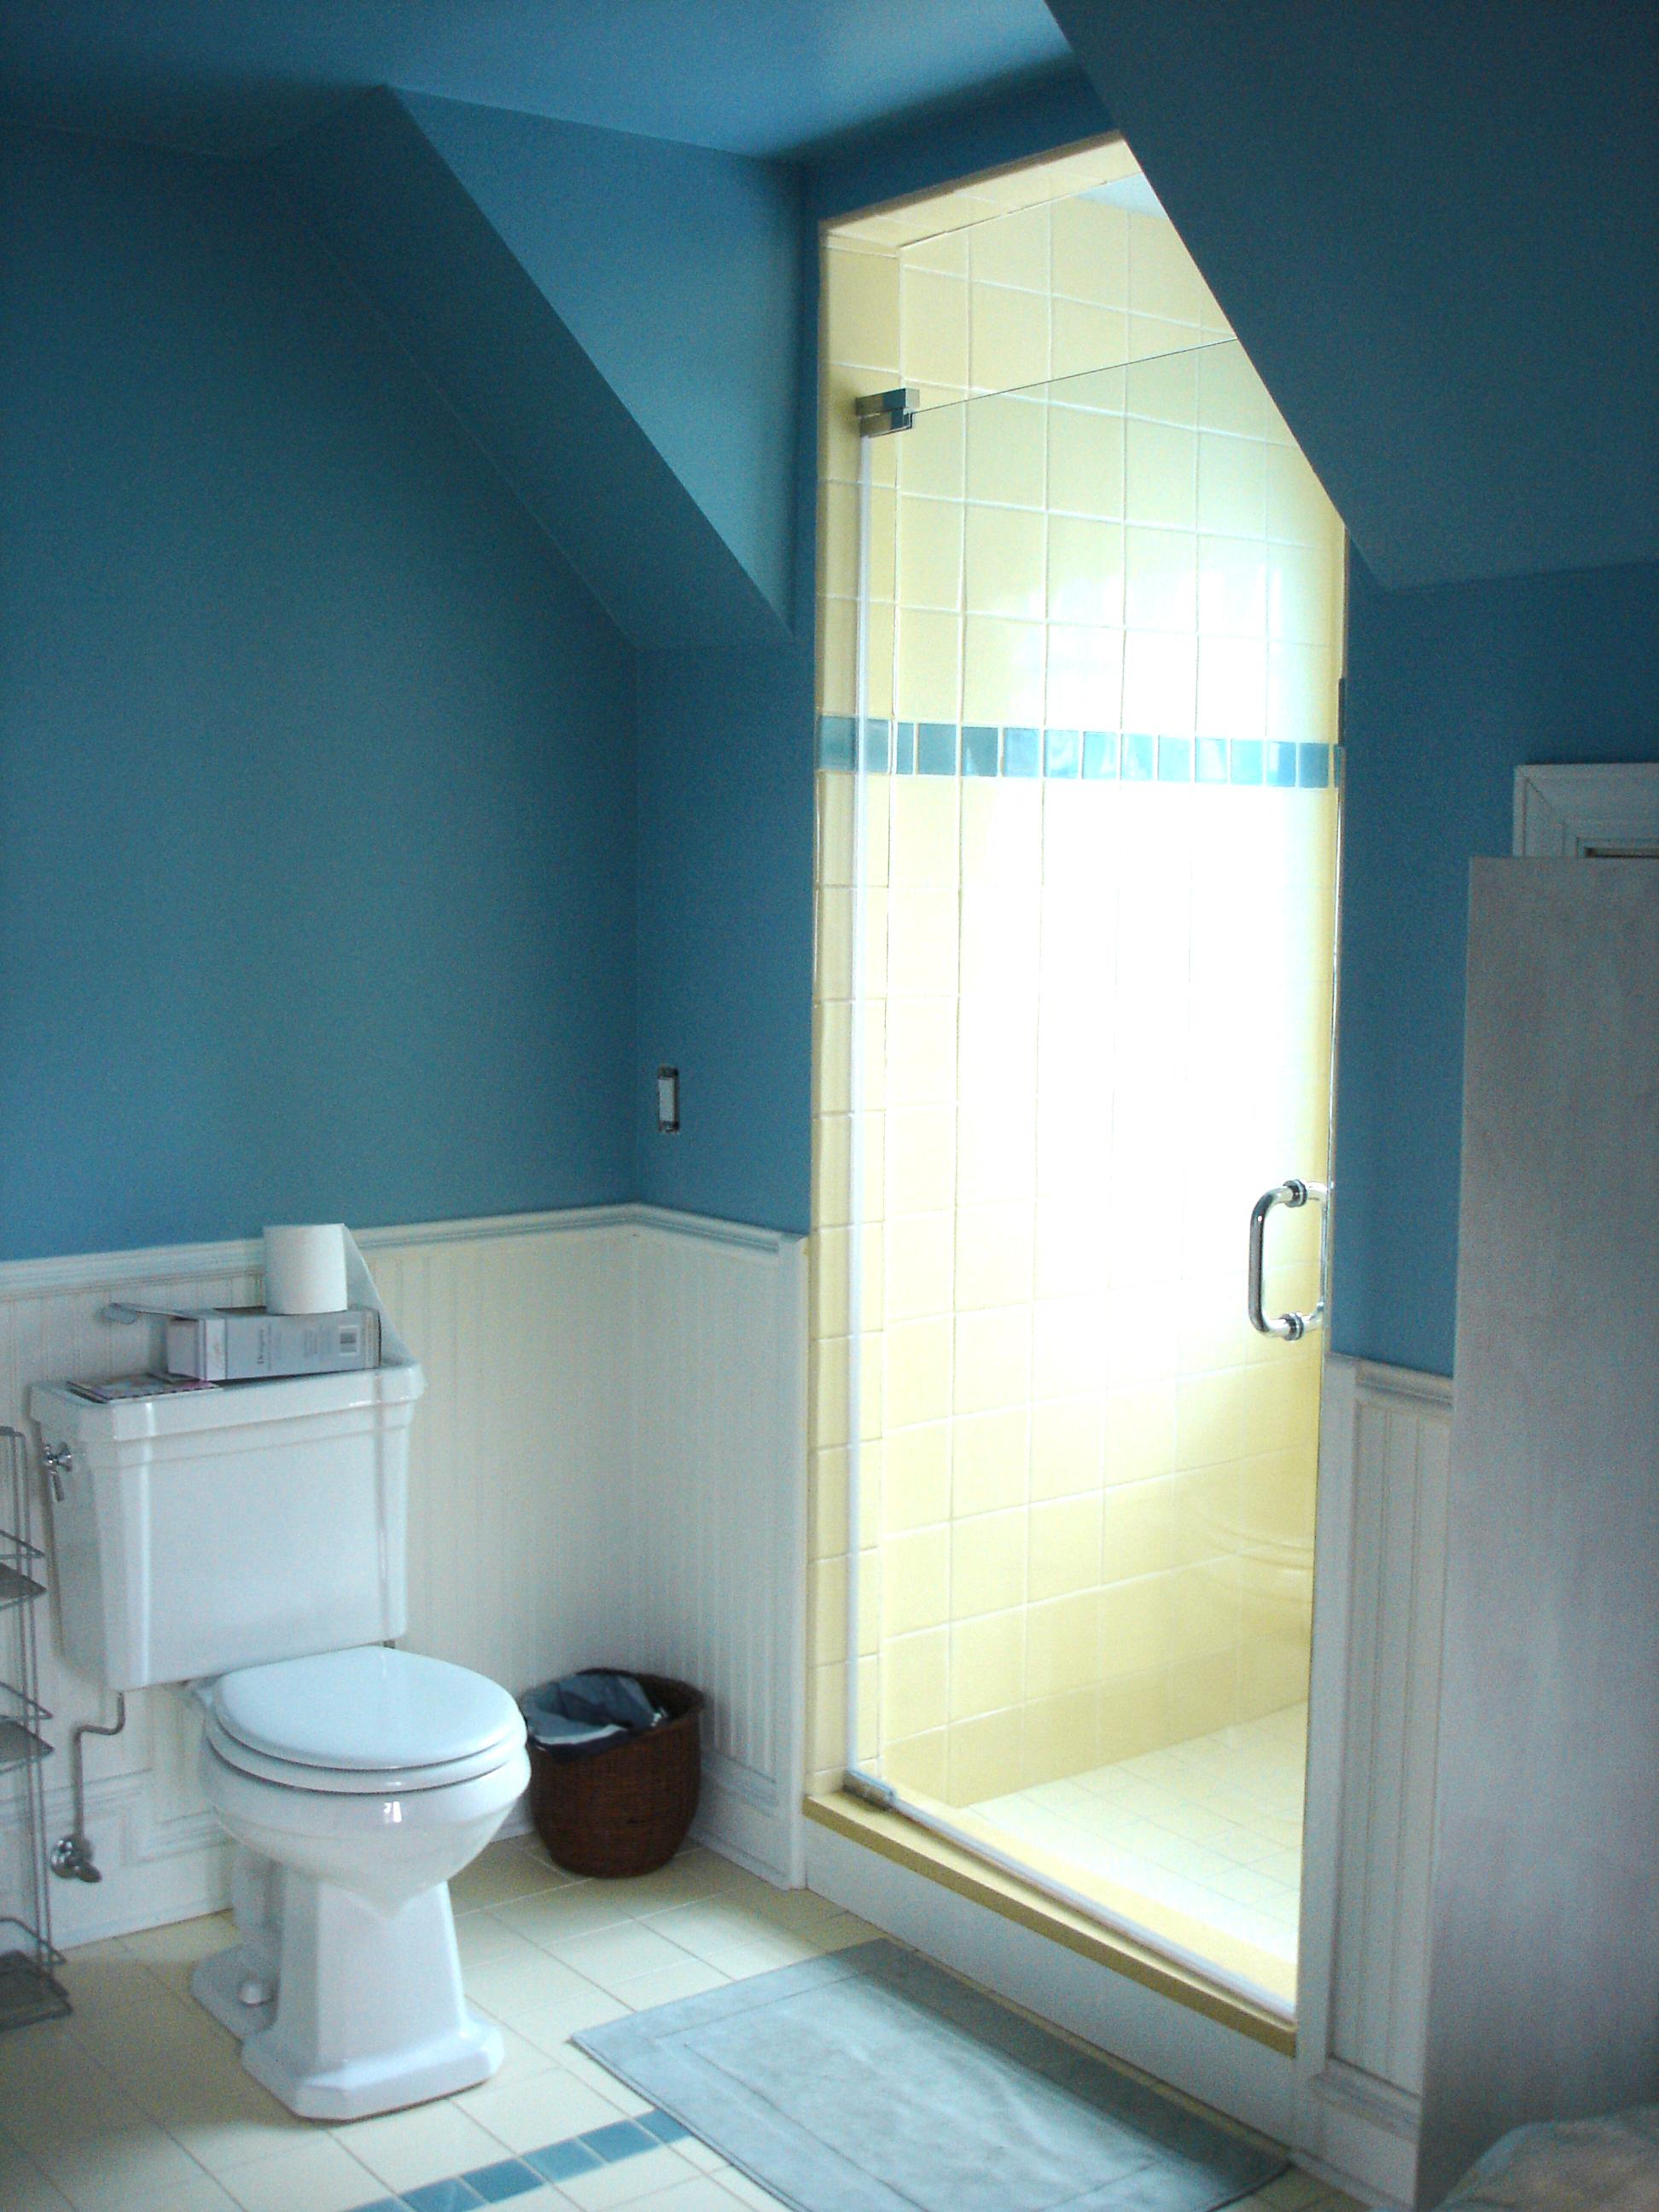 custom single-family residential home renovation, 1920s four-bedoom house, attic bedroom suite, skylight, bathroom